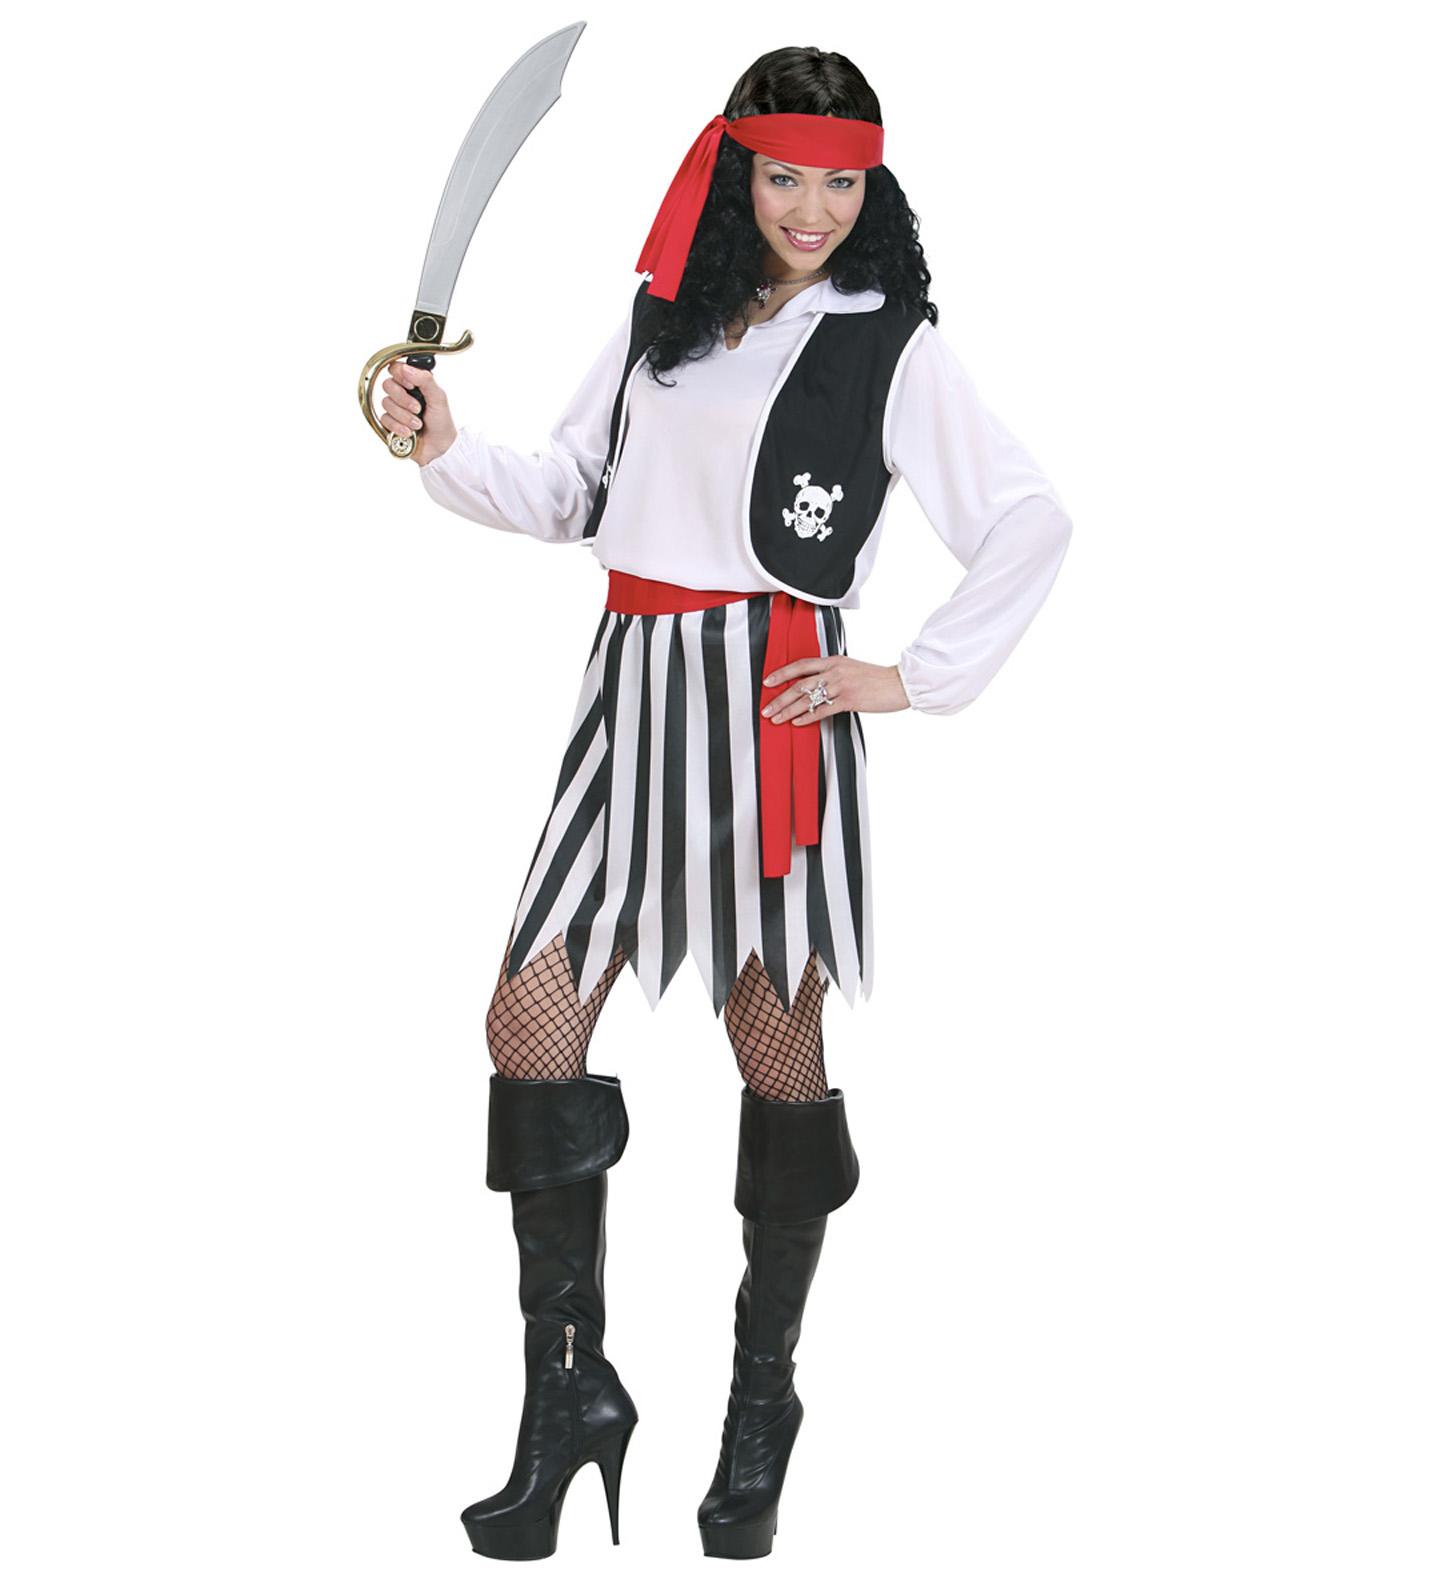 Piraten Kostüm, Piratin, Freibeuterin, Damen Karneval  S, M,  L